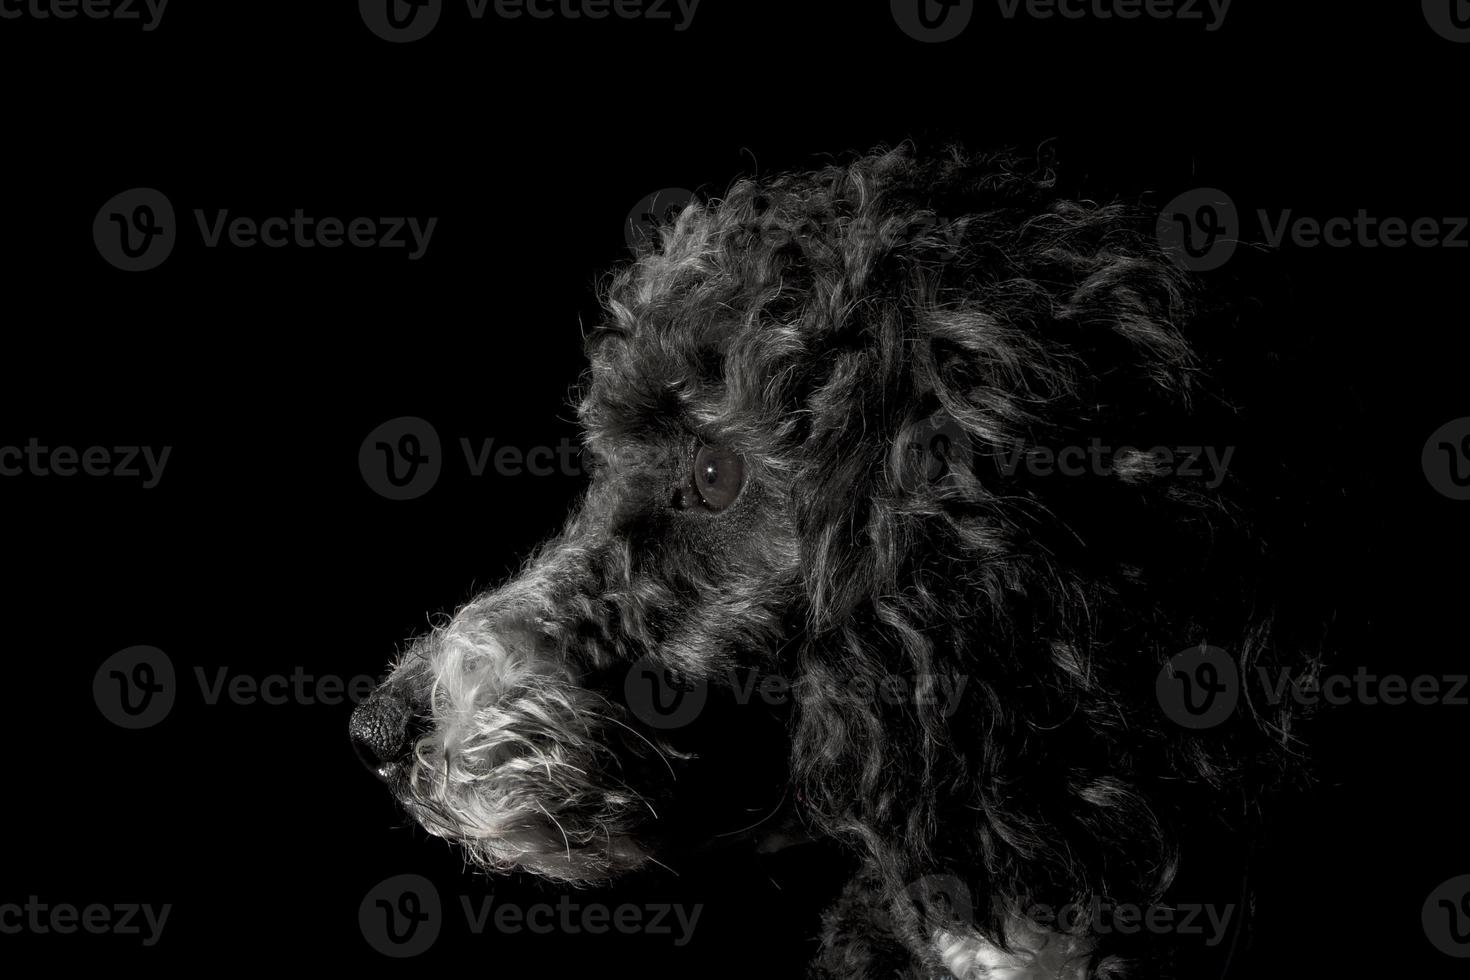 foto de perfil de cachorro poodle preto, olhando atentamente